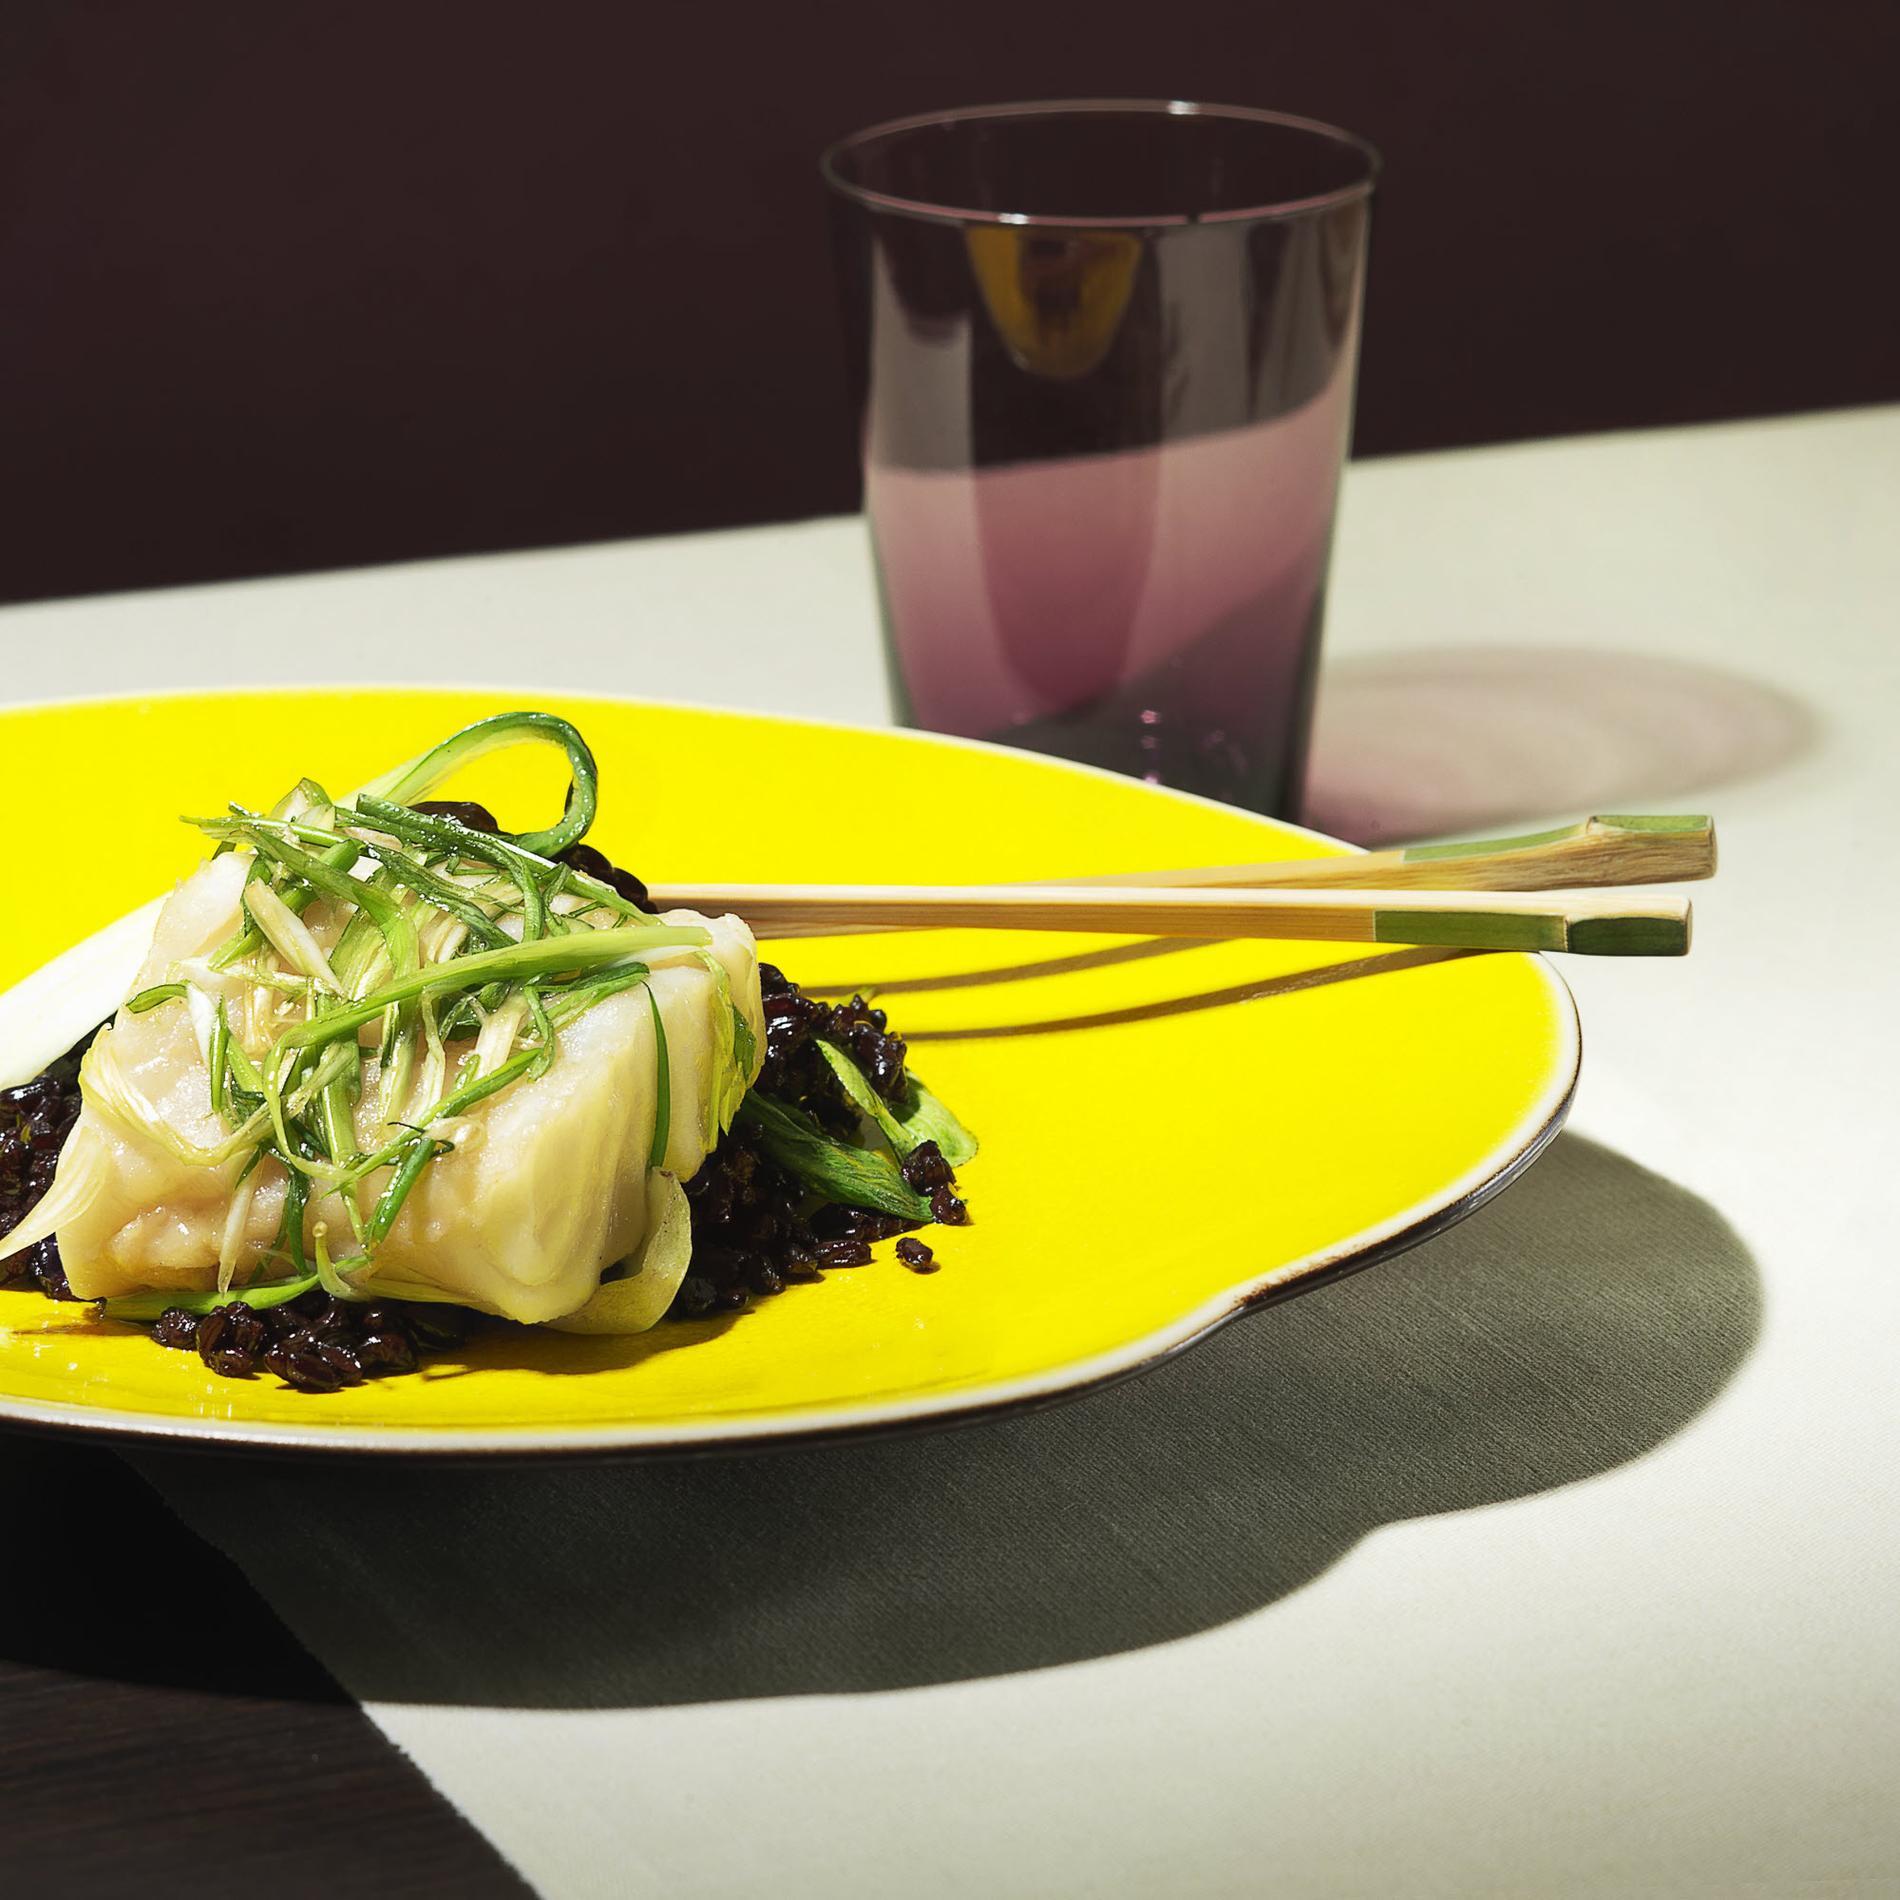 recette lieu jaune au riz noir et ciboule cuisine madame figaro. Black Bedroom Furniture Sets. Home Design Ideas